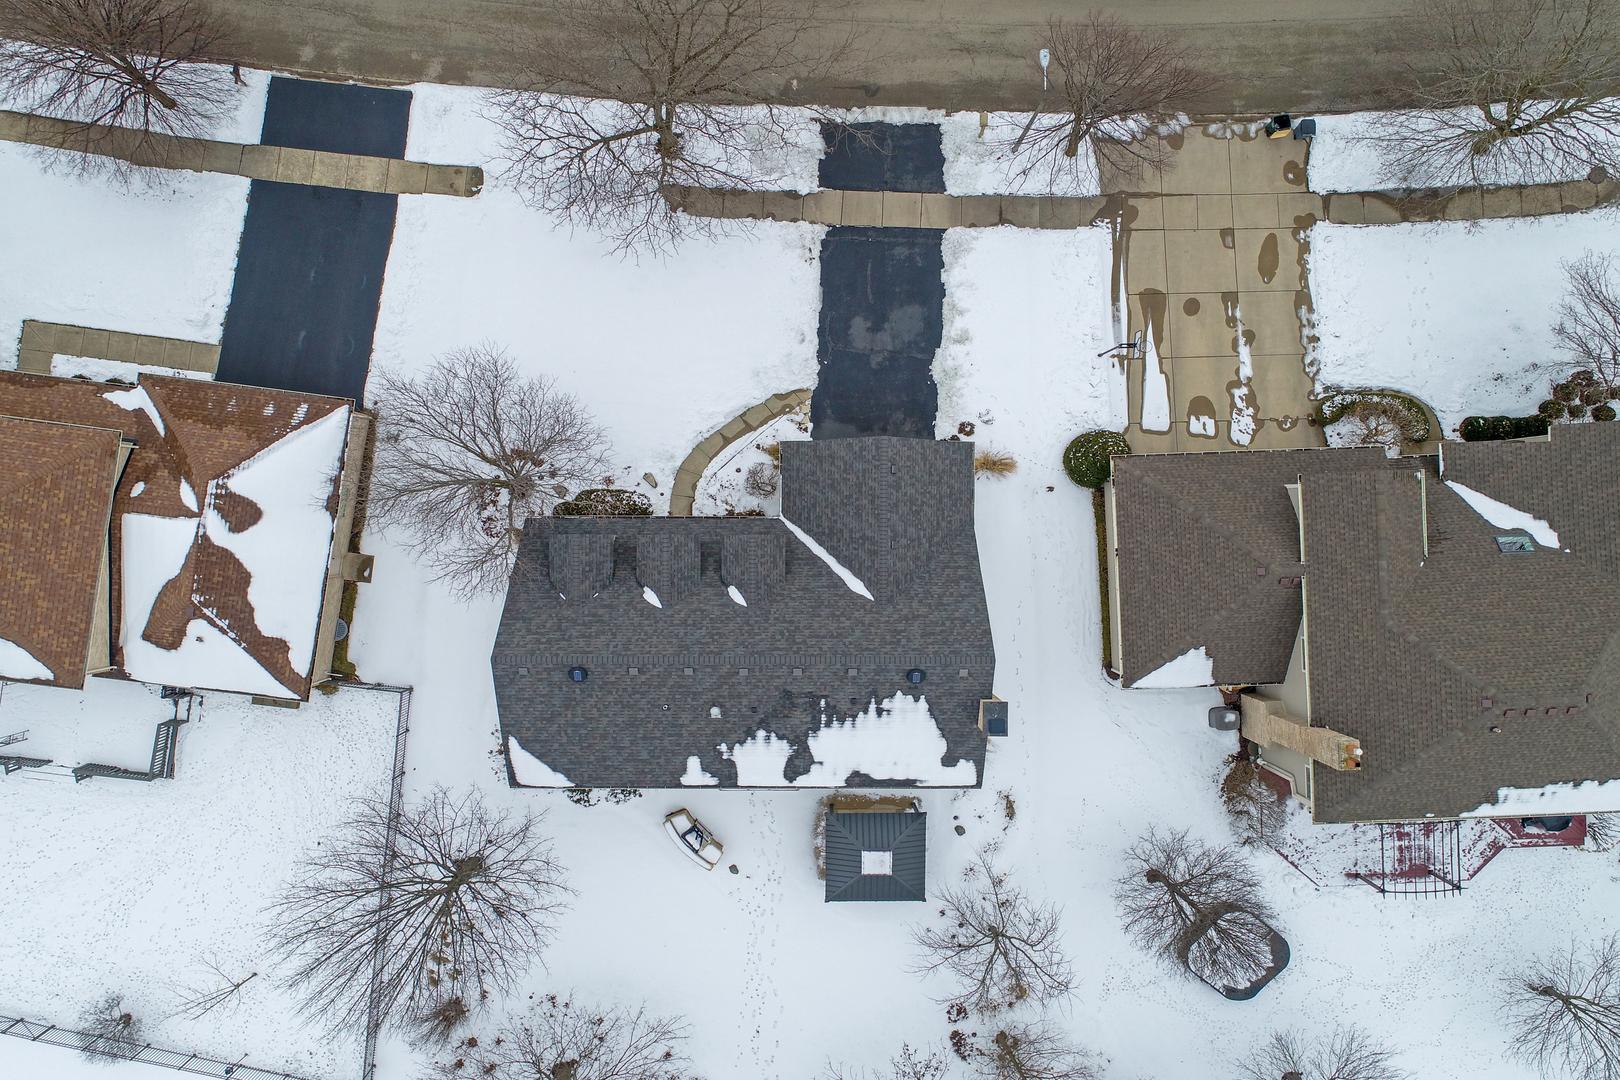 507 Waubonsee, Oswego, Illinois, 60543